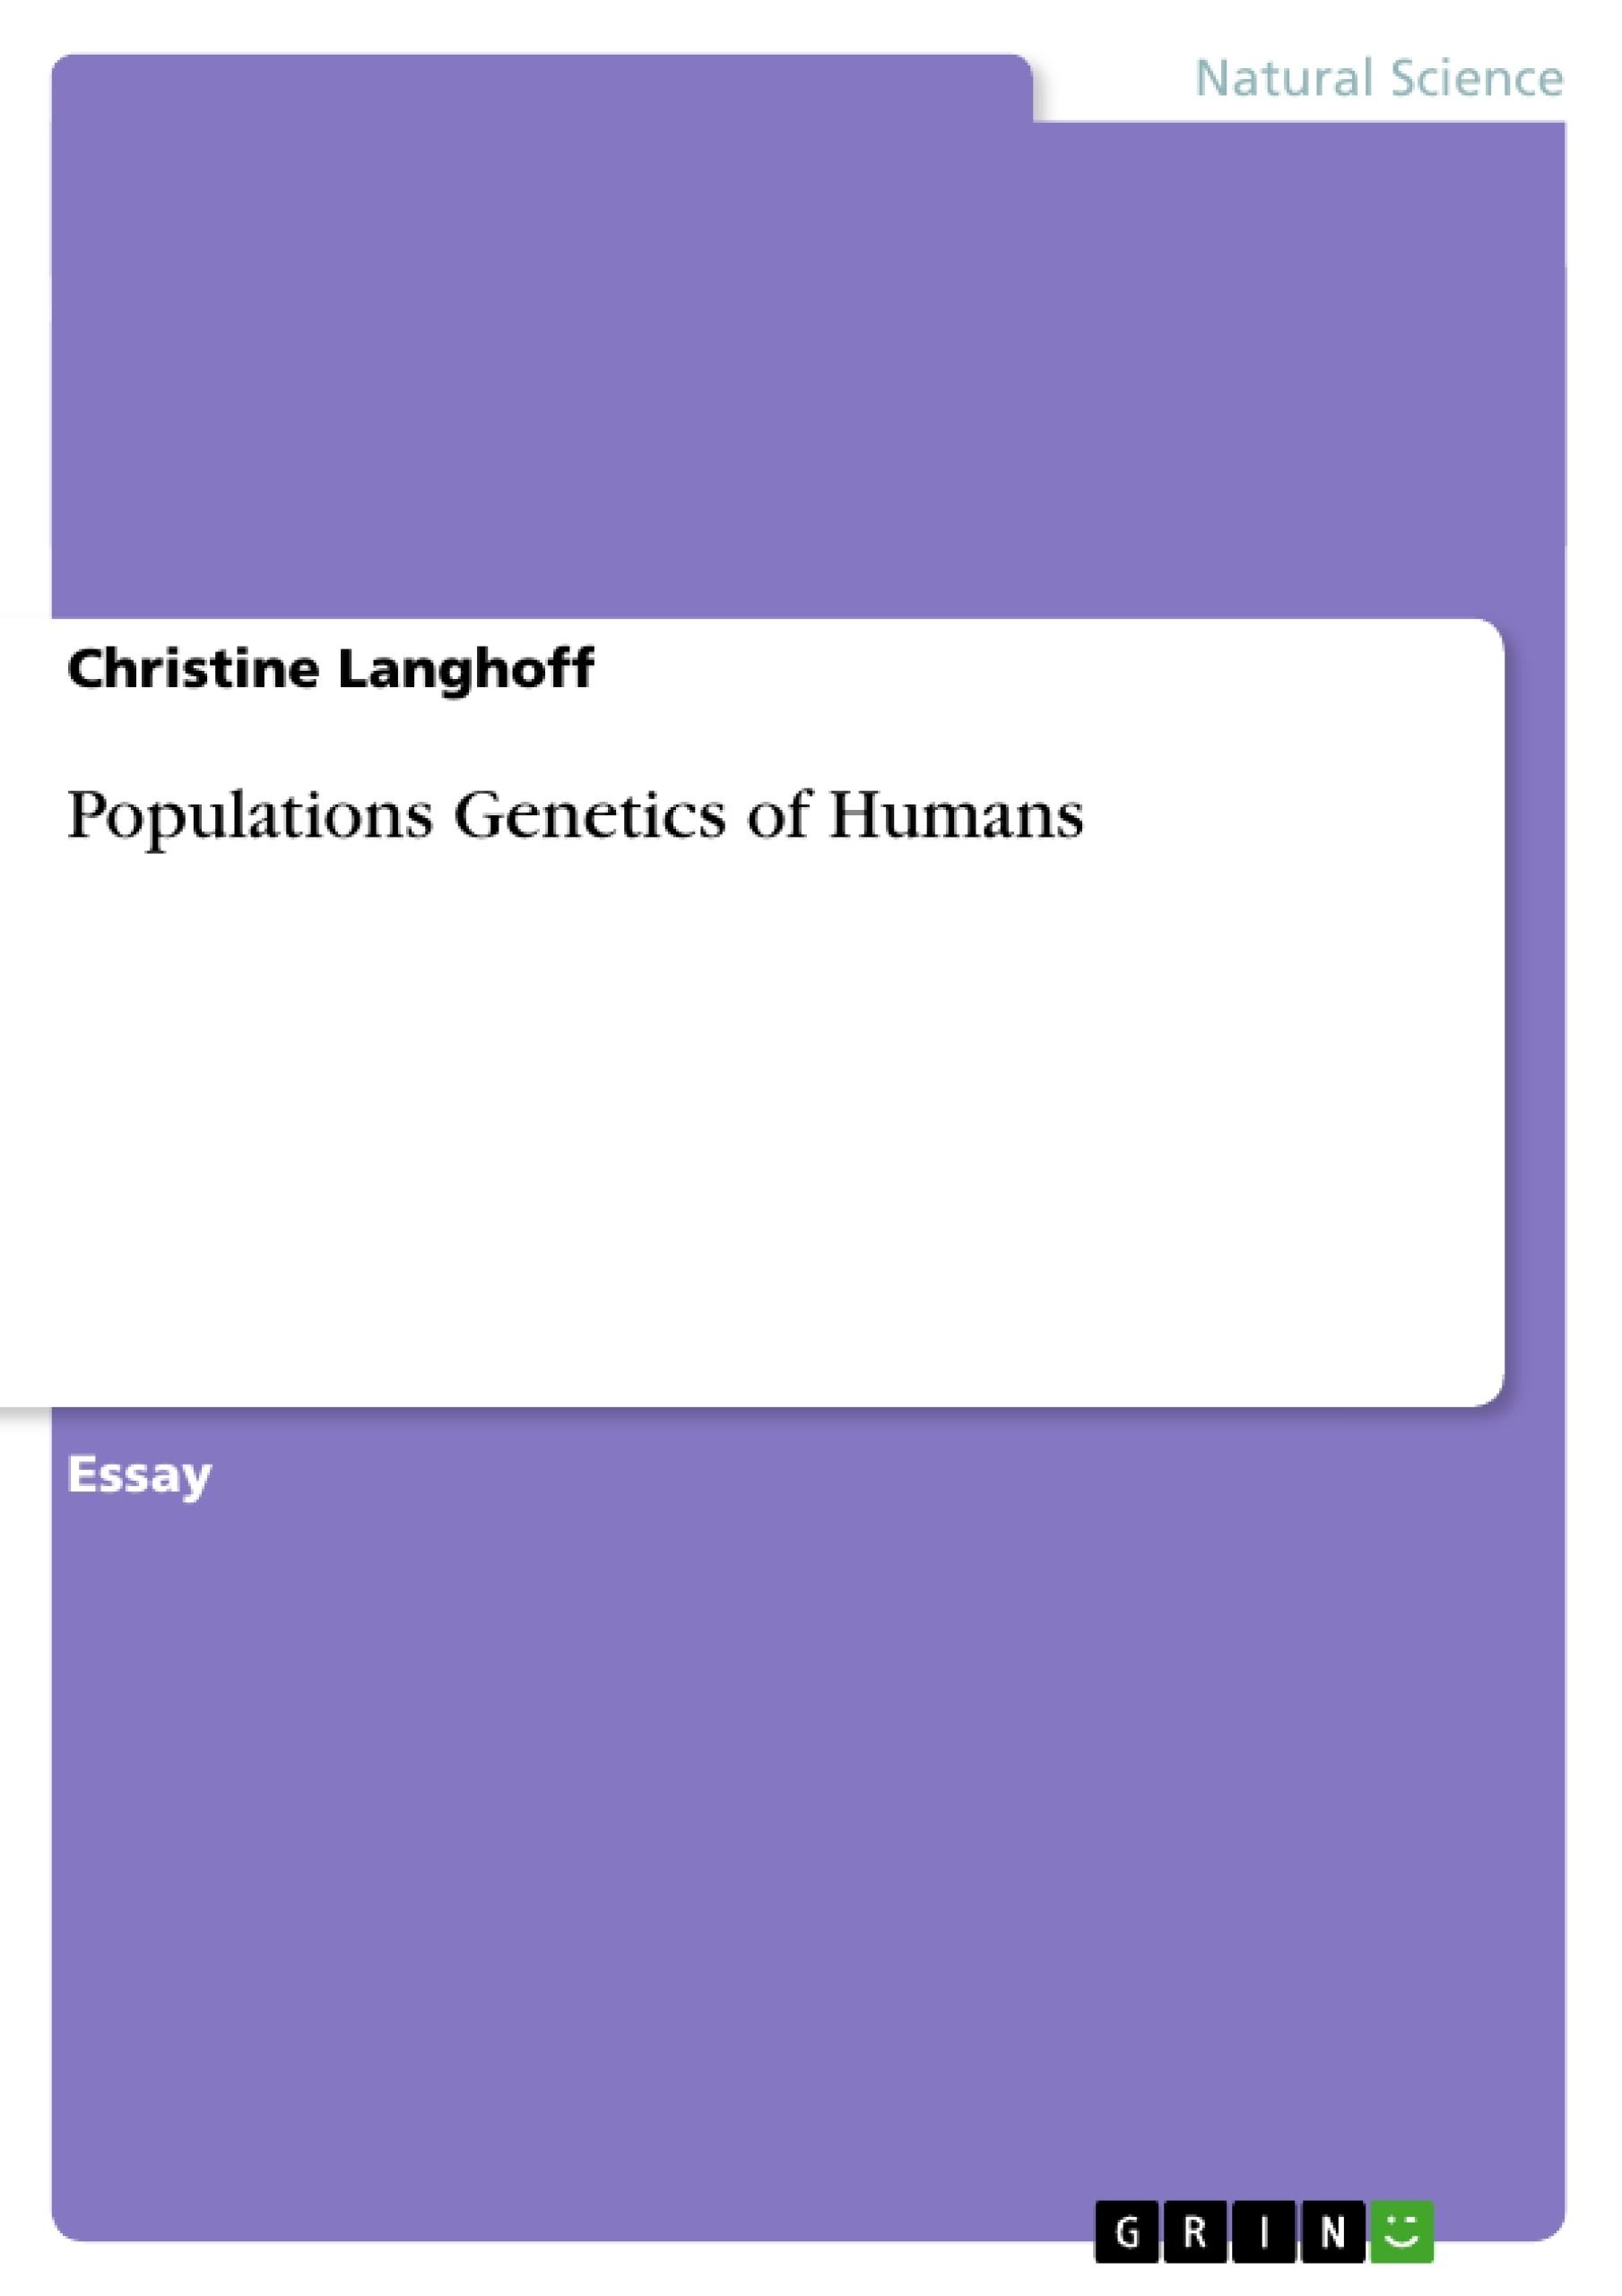 Title: Populations Genetics of Humans